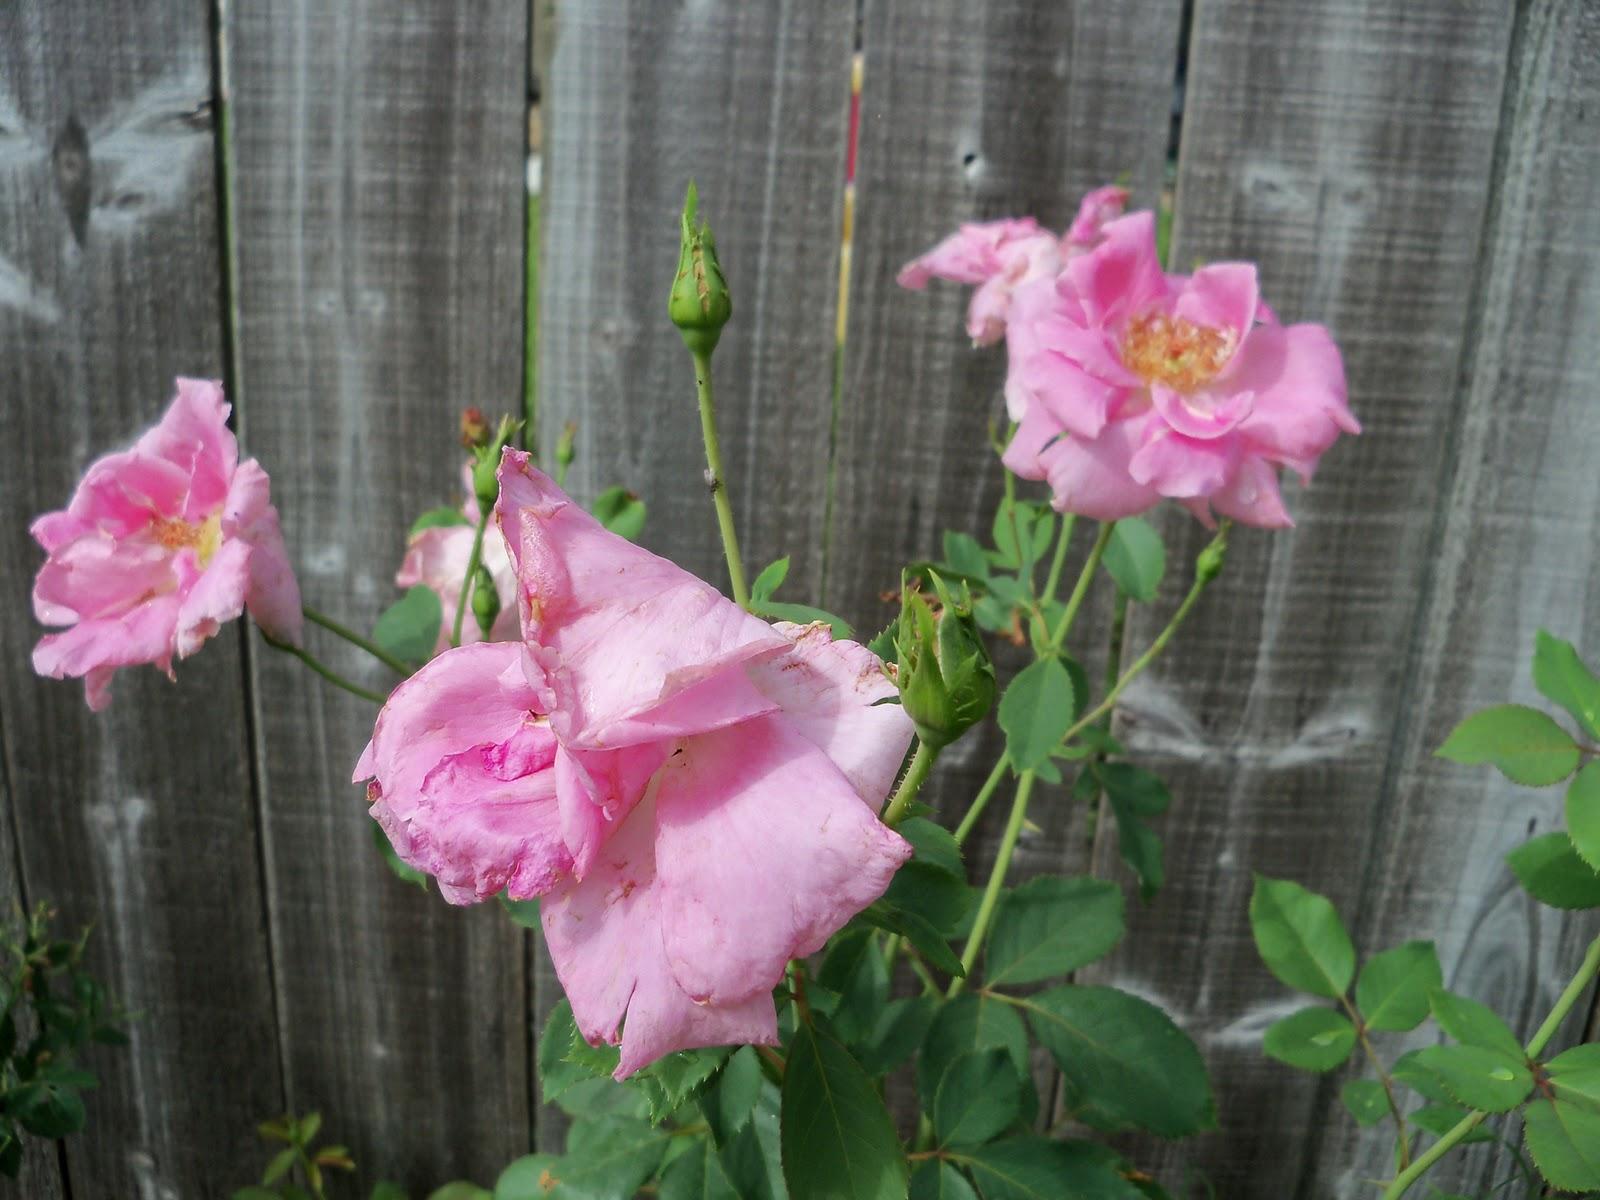 Gardening 2010, Part Three - 101_3642.JPG